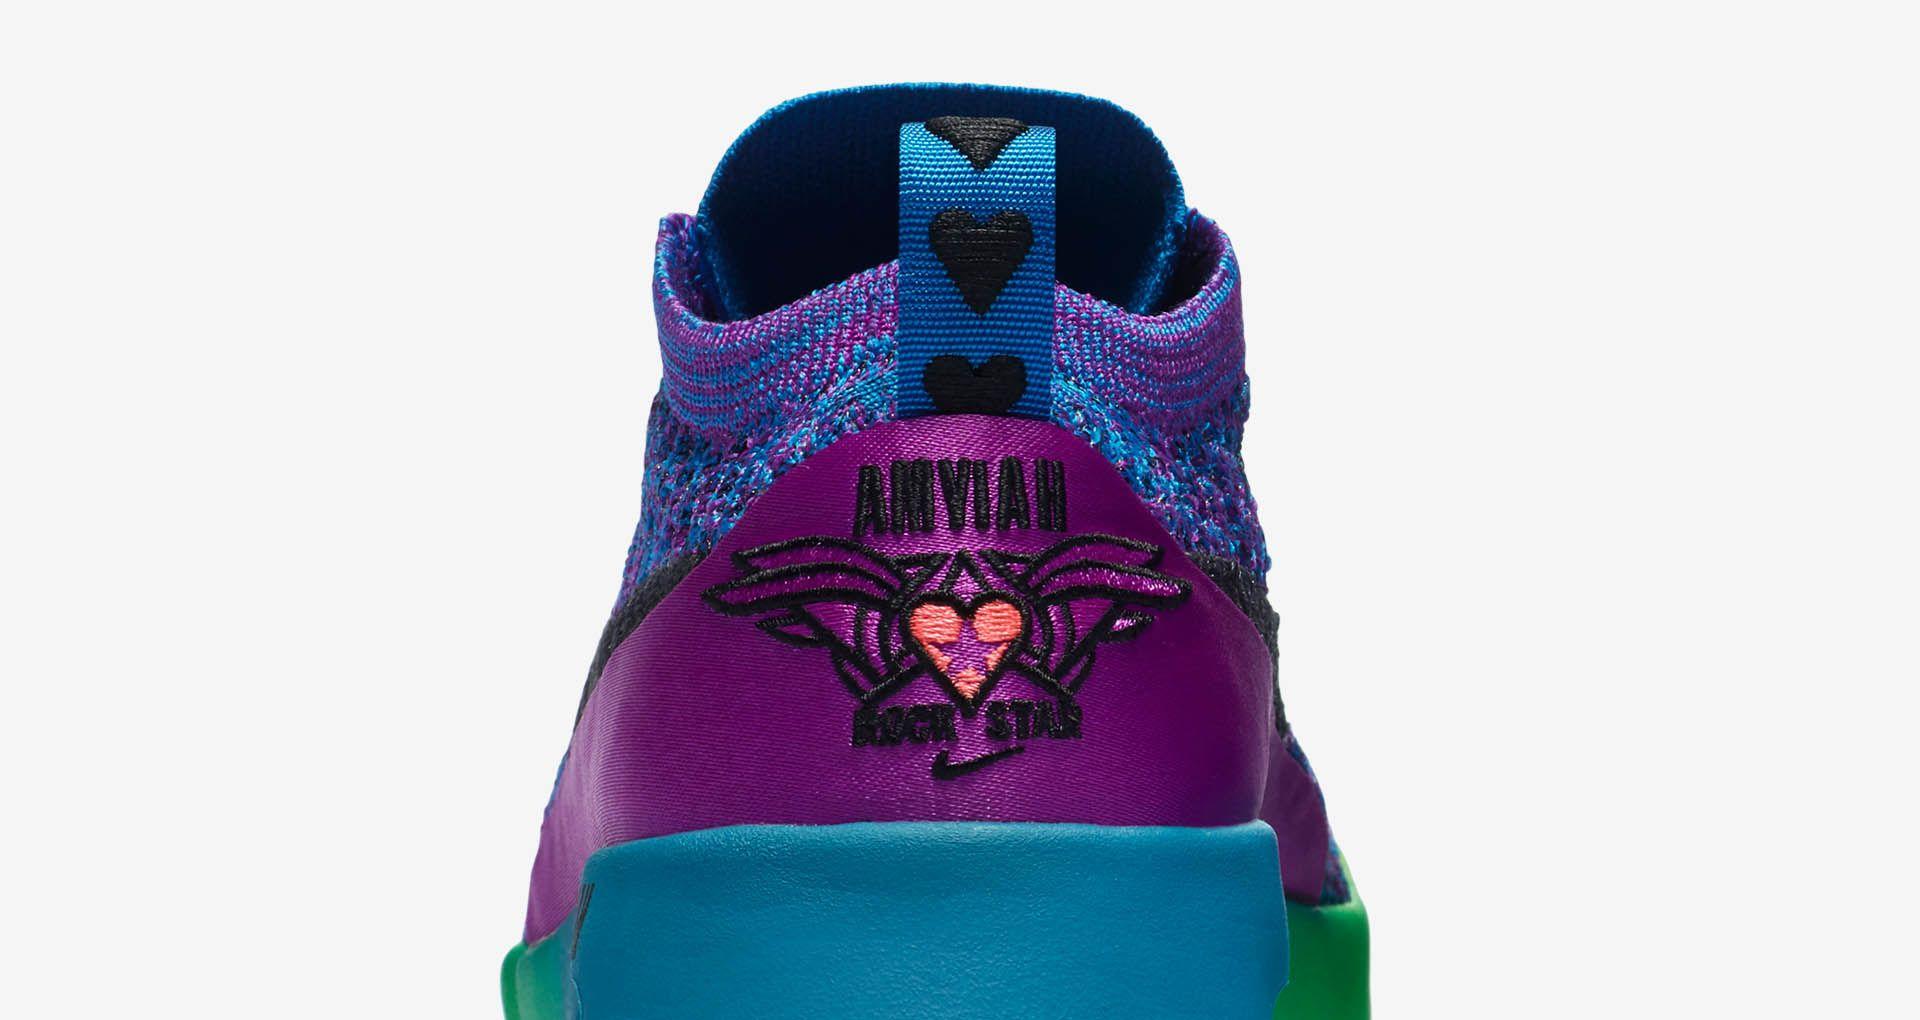 b82fcb7cac Women's Nike Air Max Thea Ultra Flyknit Doernbecher Freestyle 2017 'Vivid  Purple & Blue Orbit